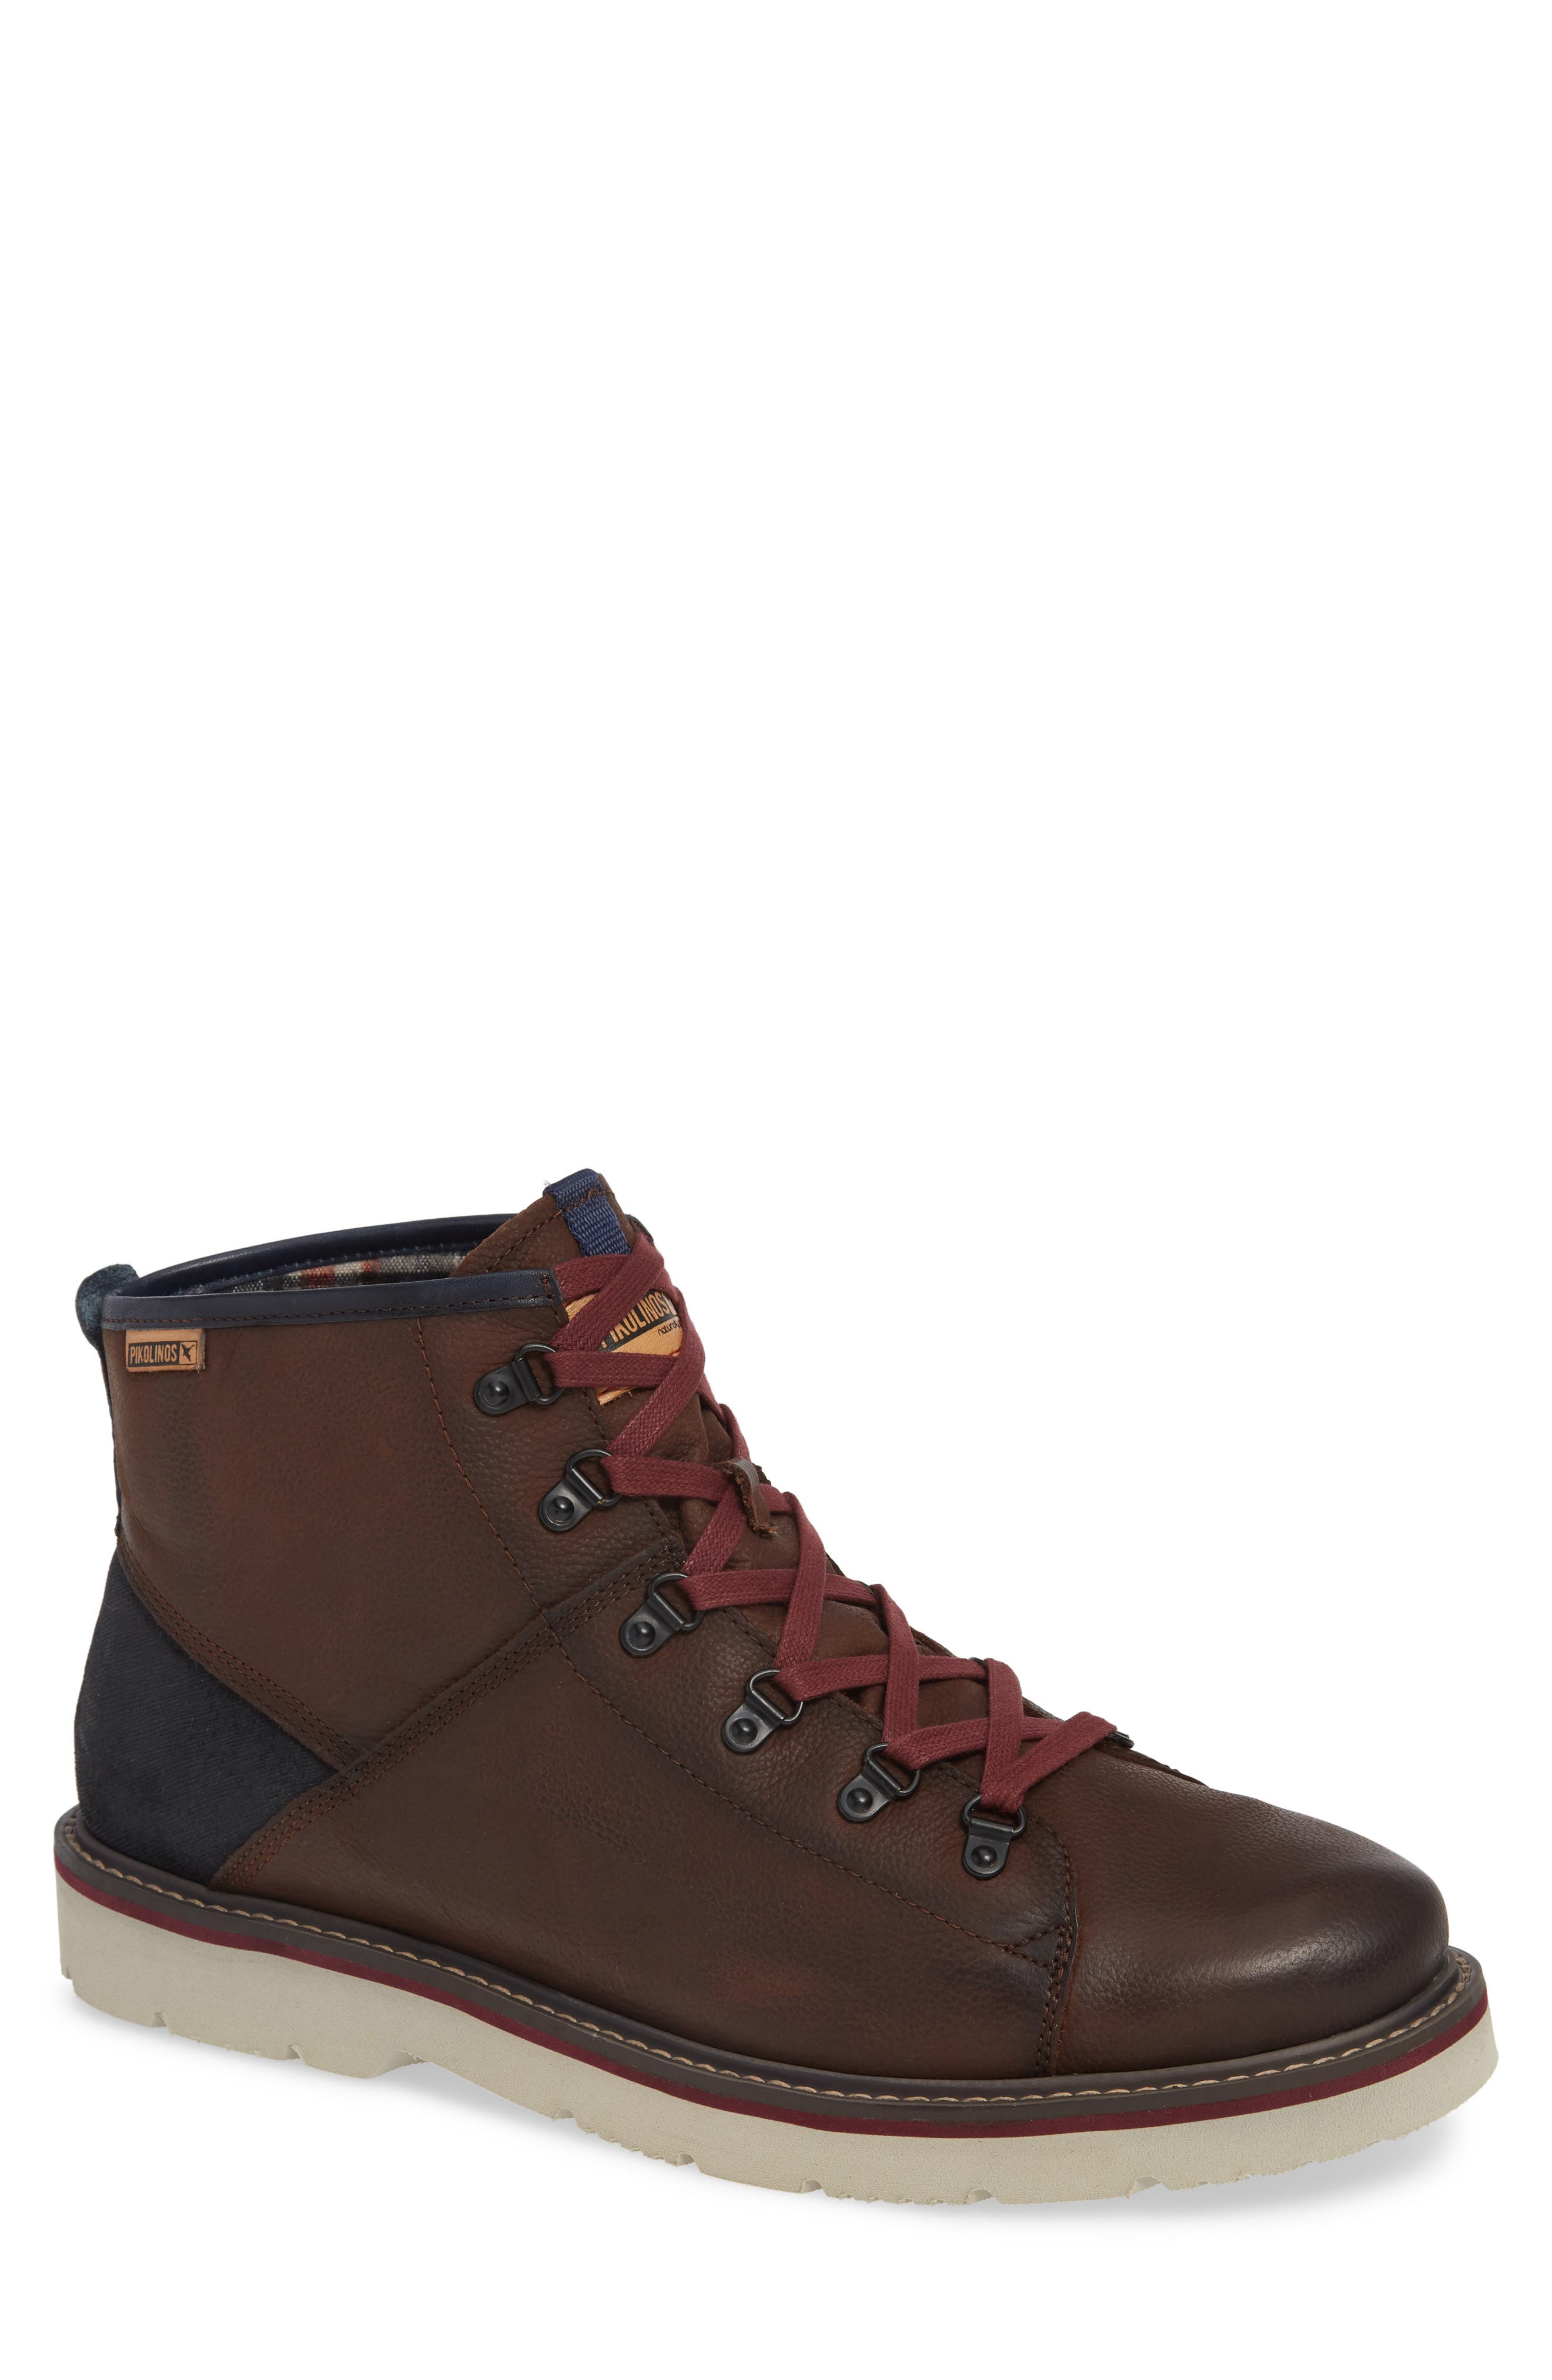 LLeida Plain Toe Boot,                             Main thumbnail 1, color,                             617